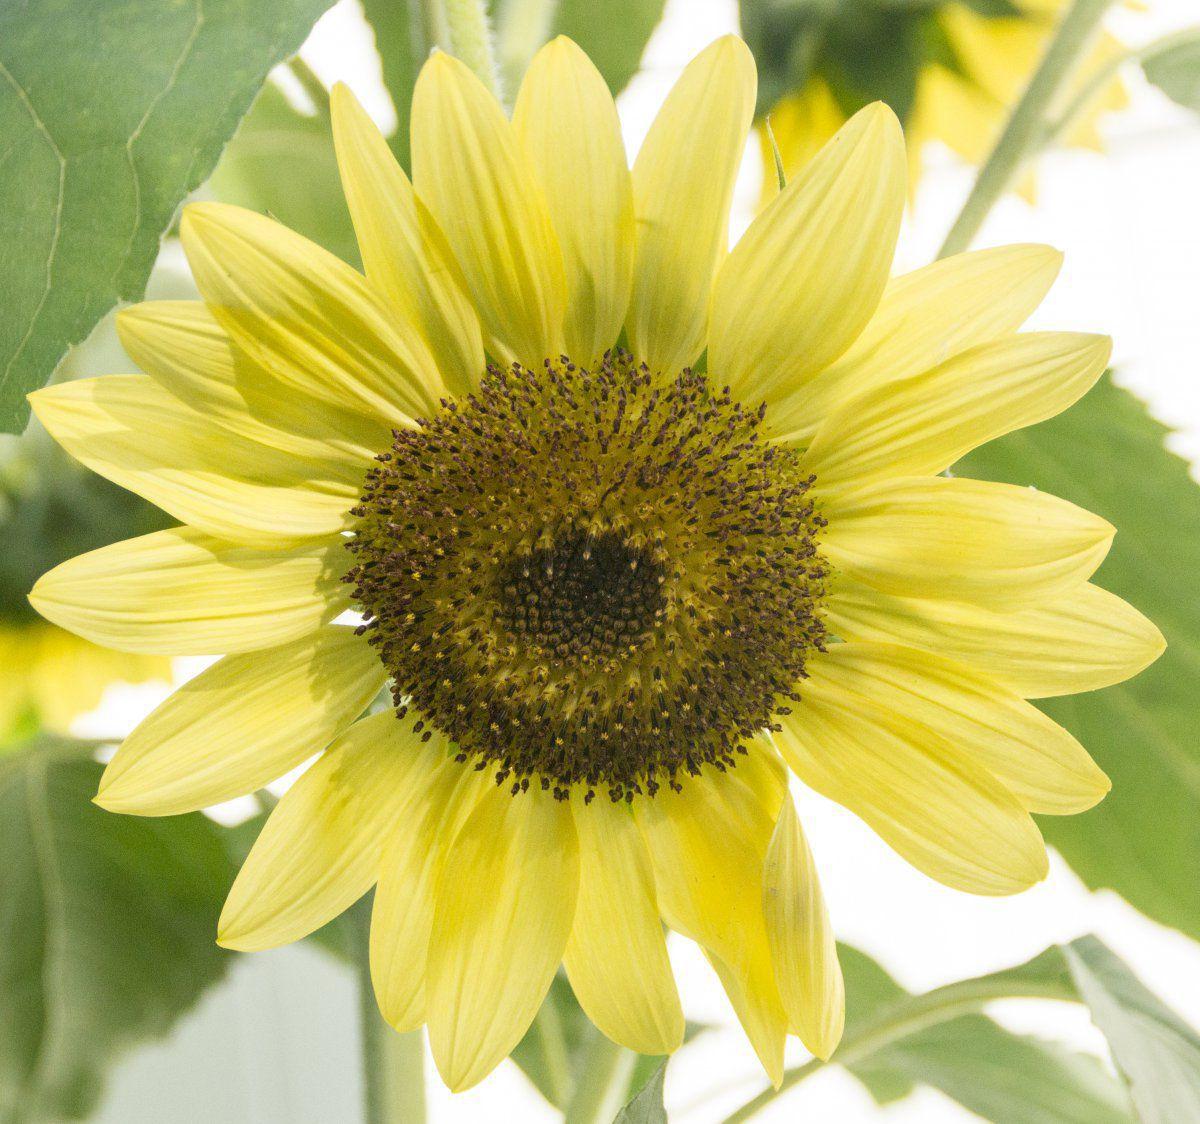 2013-09-05 Sunflower 'Japanese Silver-Leaf' (close-up).jpg